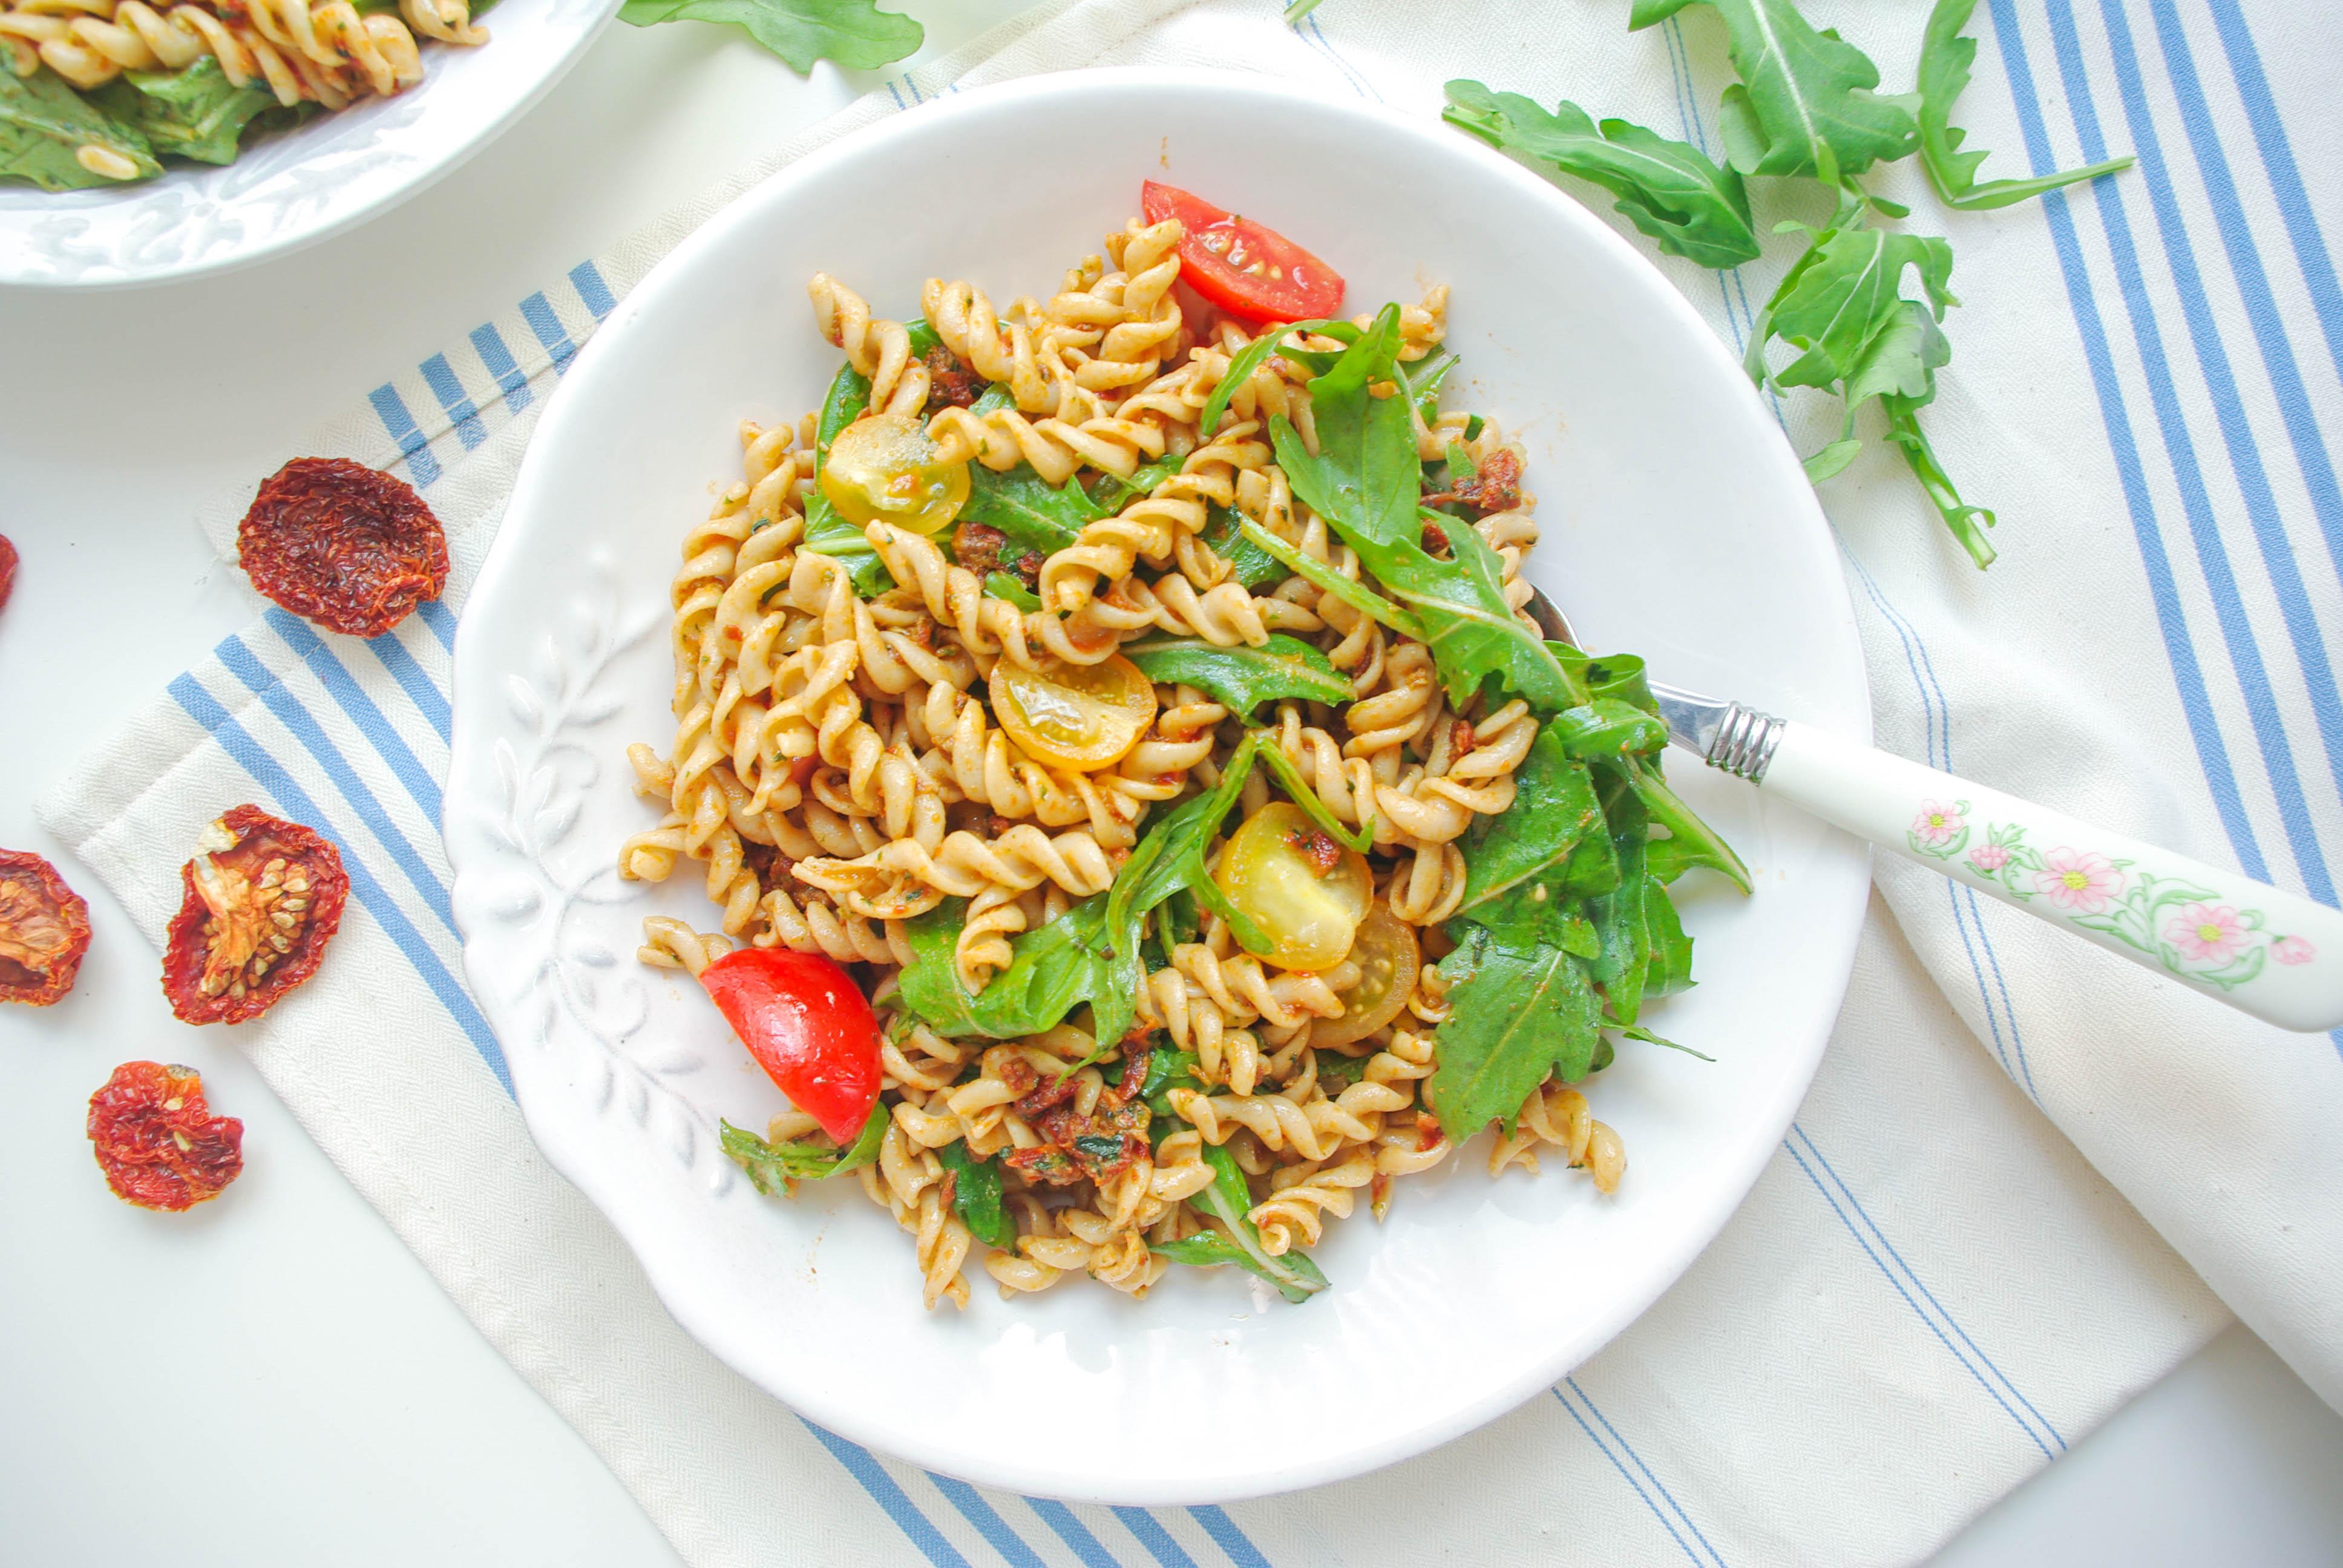 Nudelsalat mit getrocknete-Tomaten-Pesto